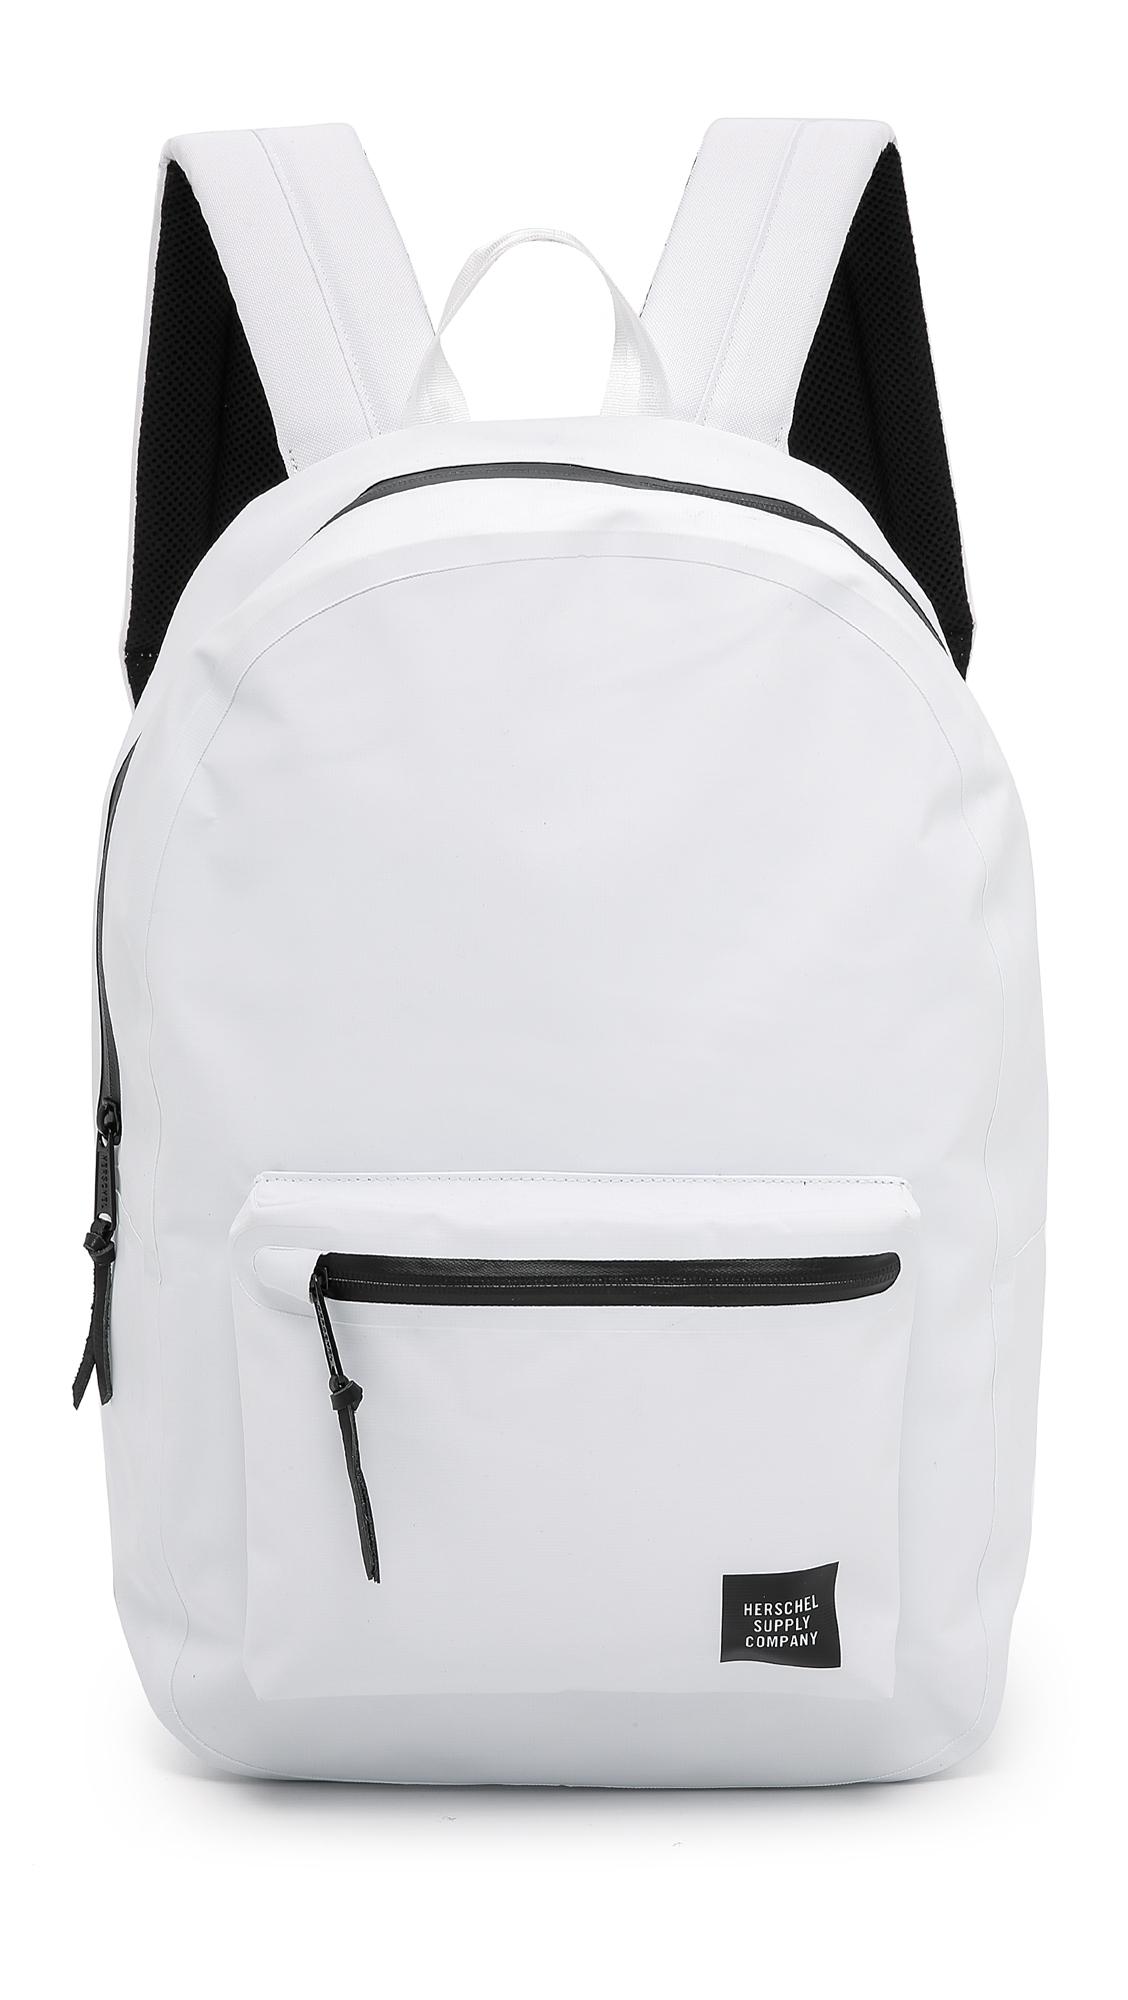 922269dcca2 Herschel Supply Co. Studio Settlement Backpack in White for Men - Lyst